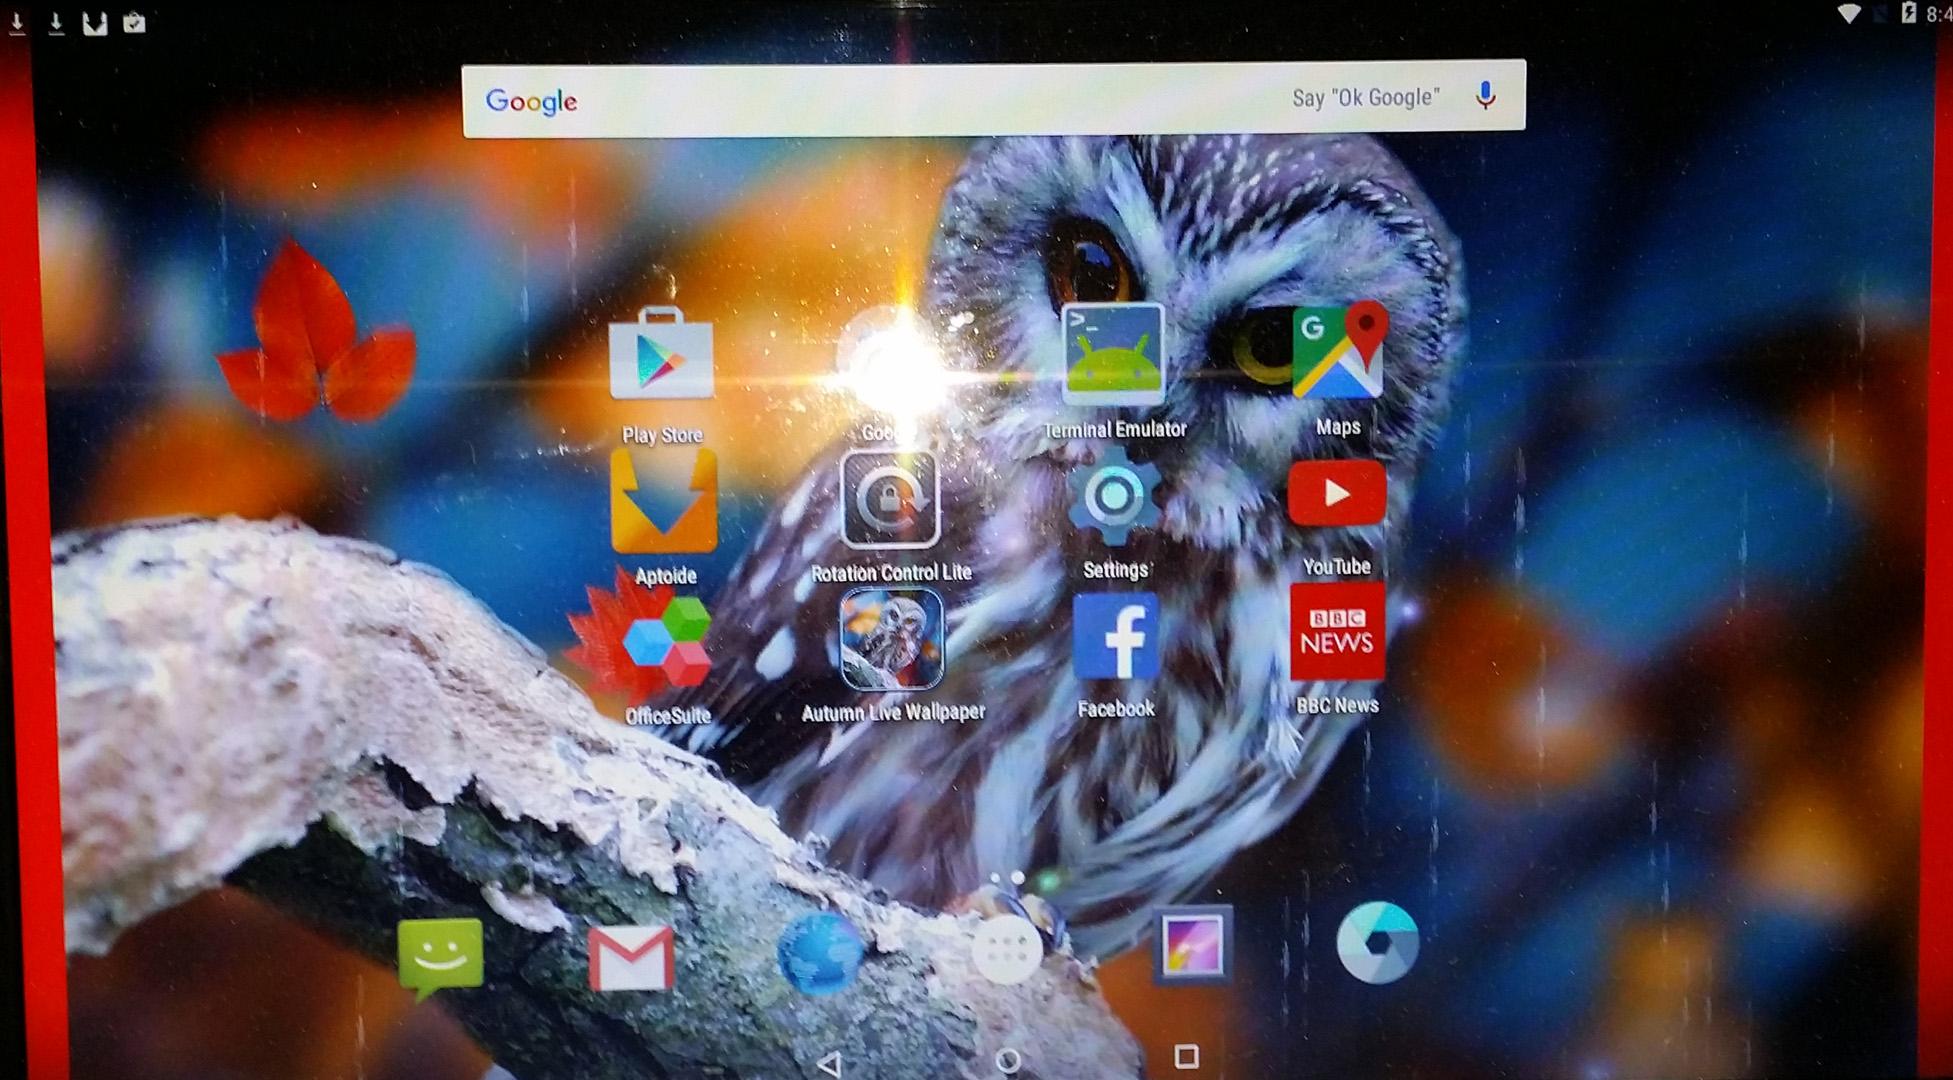 screenshot 1 andex desktop with autumn live wallpaper